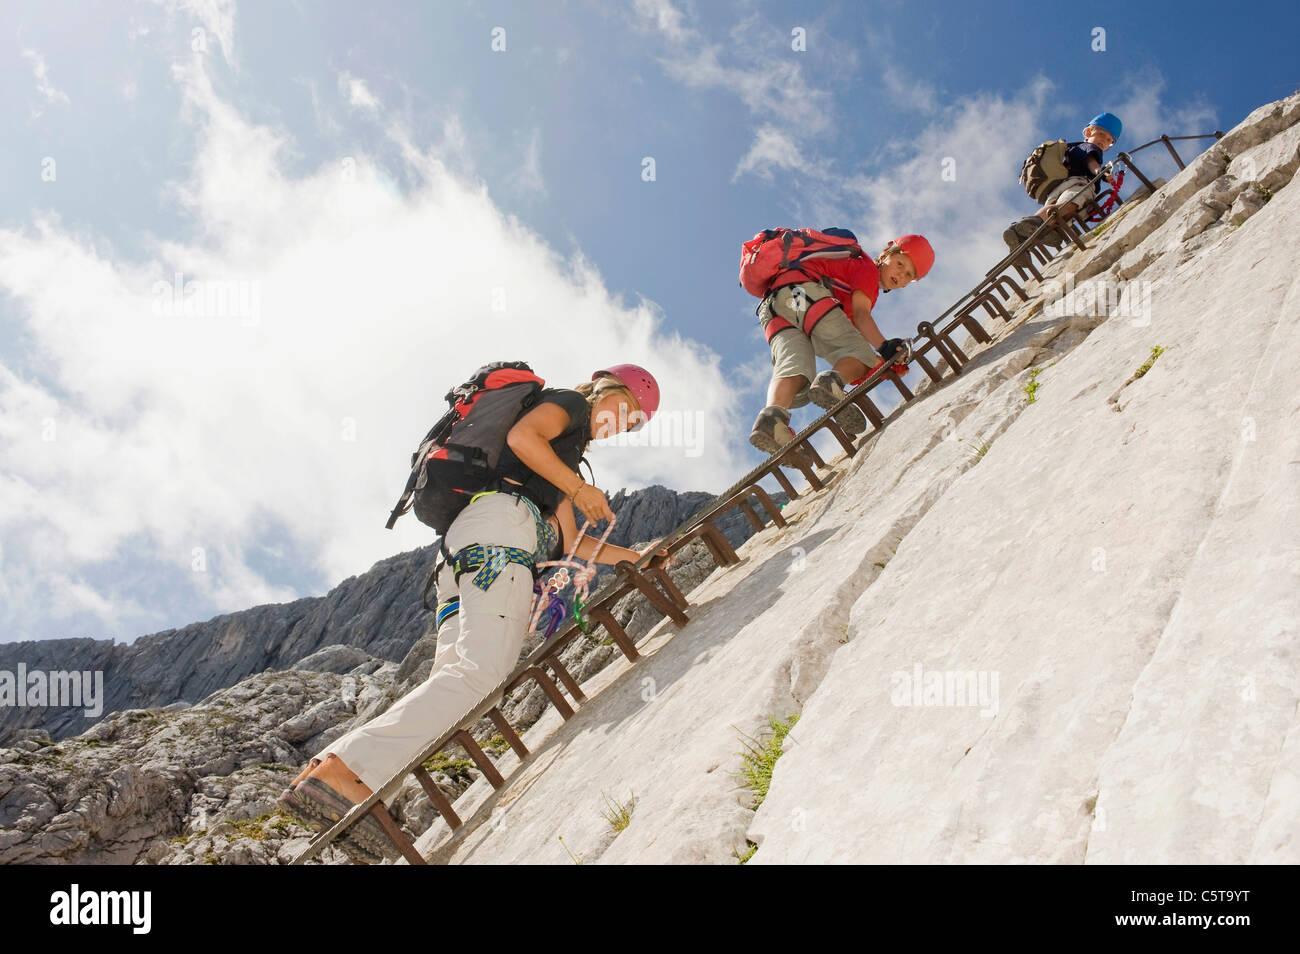 Germany, Garmisch-Partenkirchen, Alpspitz, Mother and sons (10-11), (12-13) climbing rock face on ladder - Stock Image